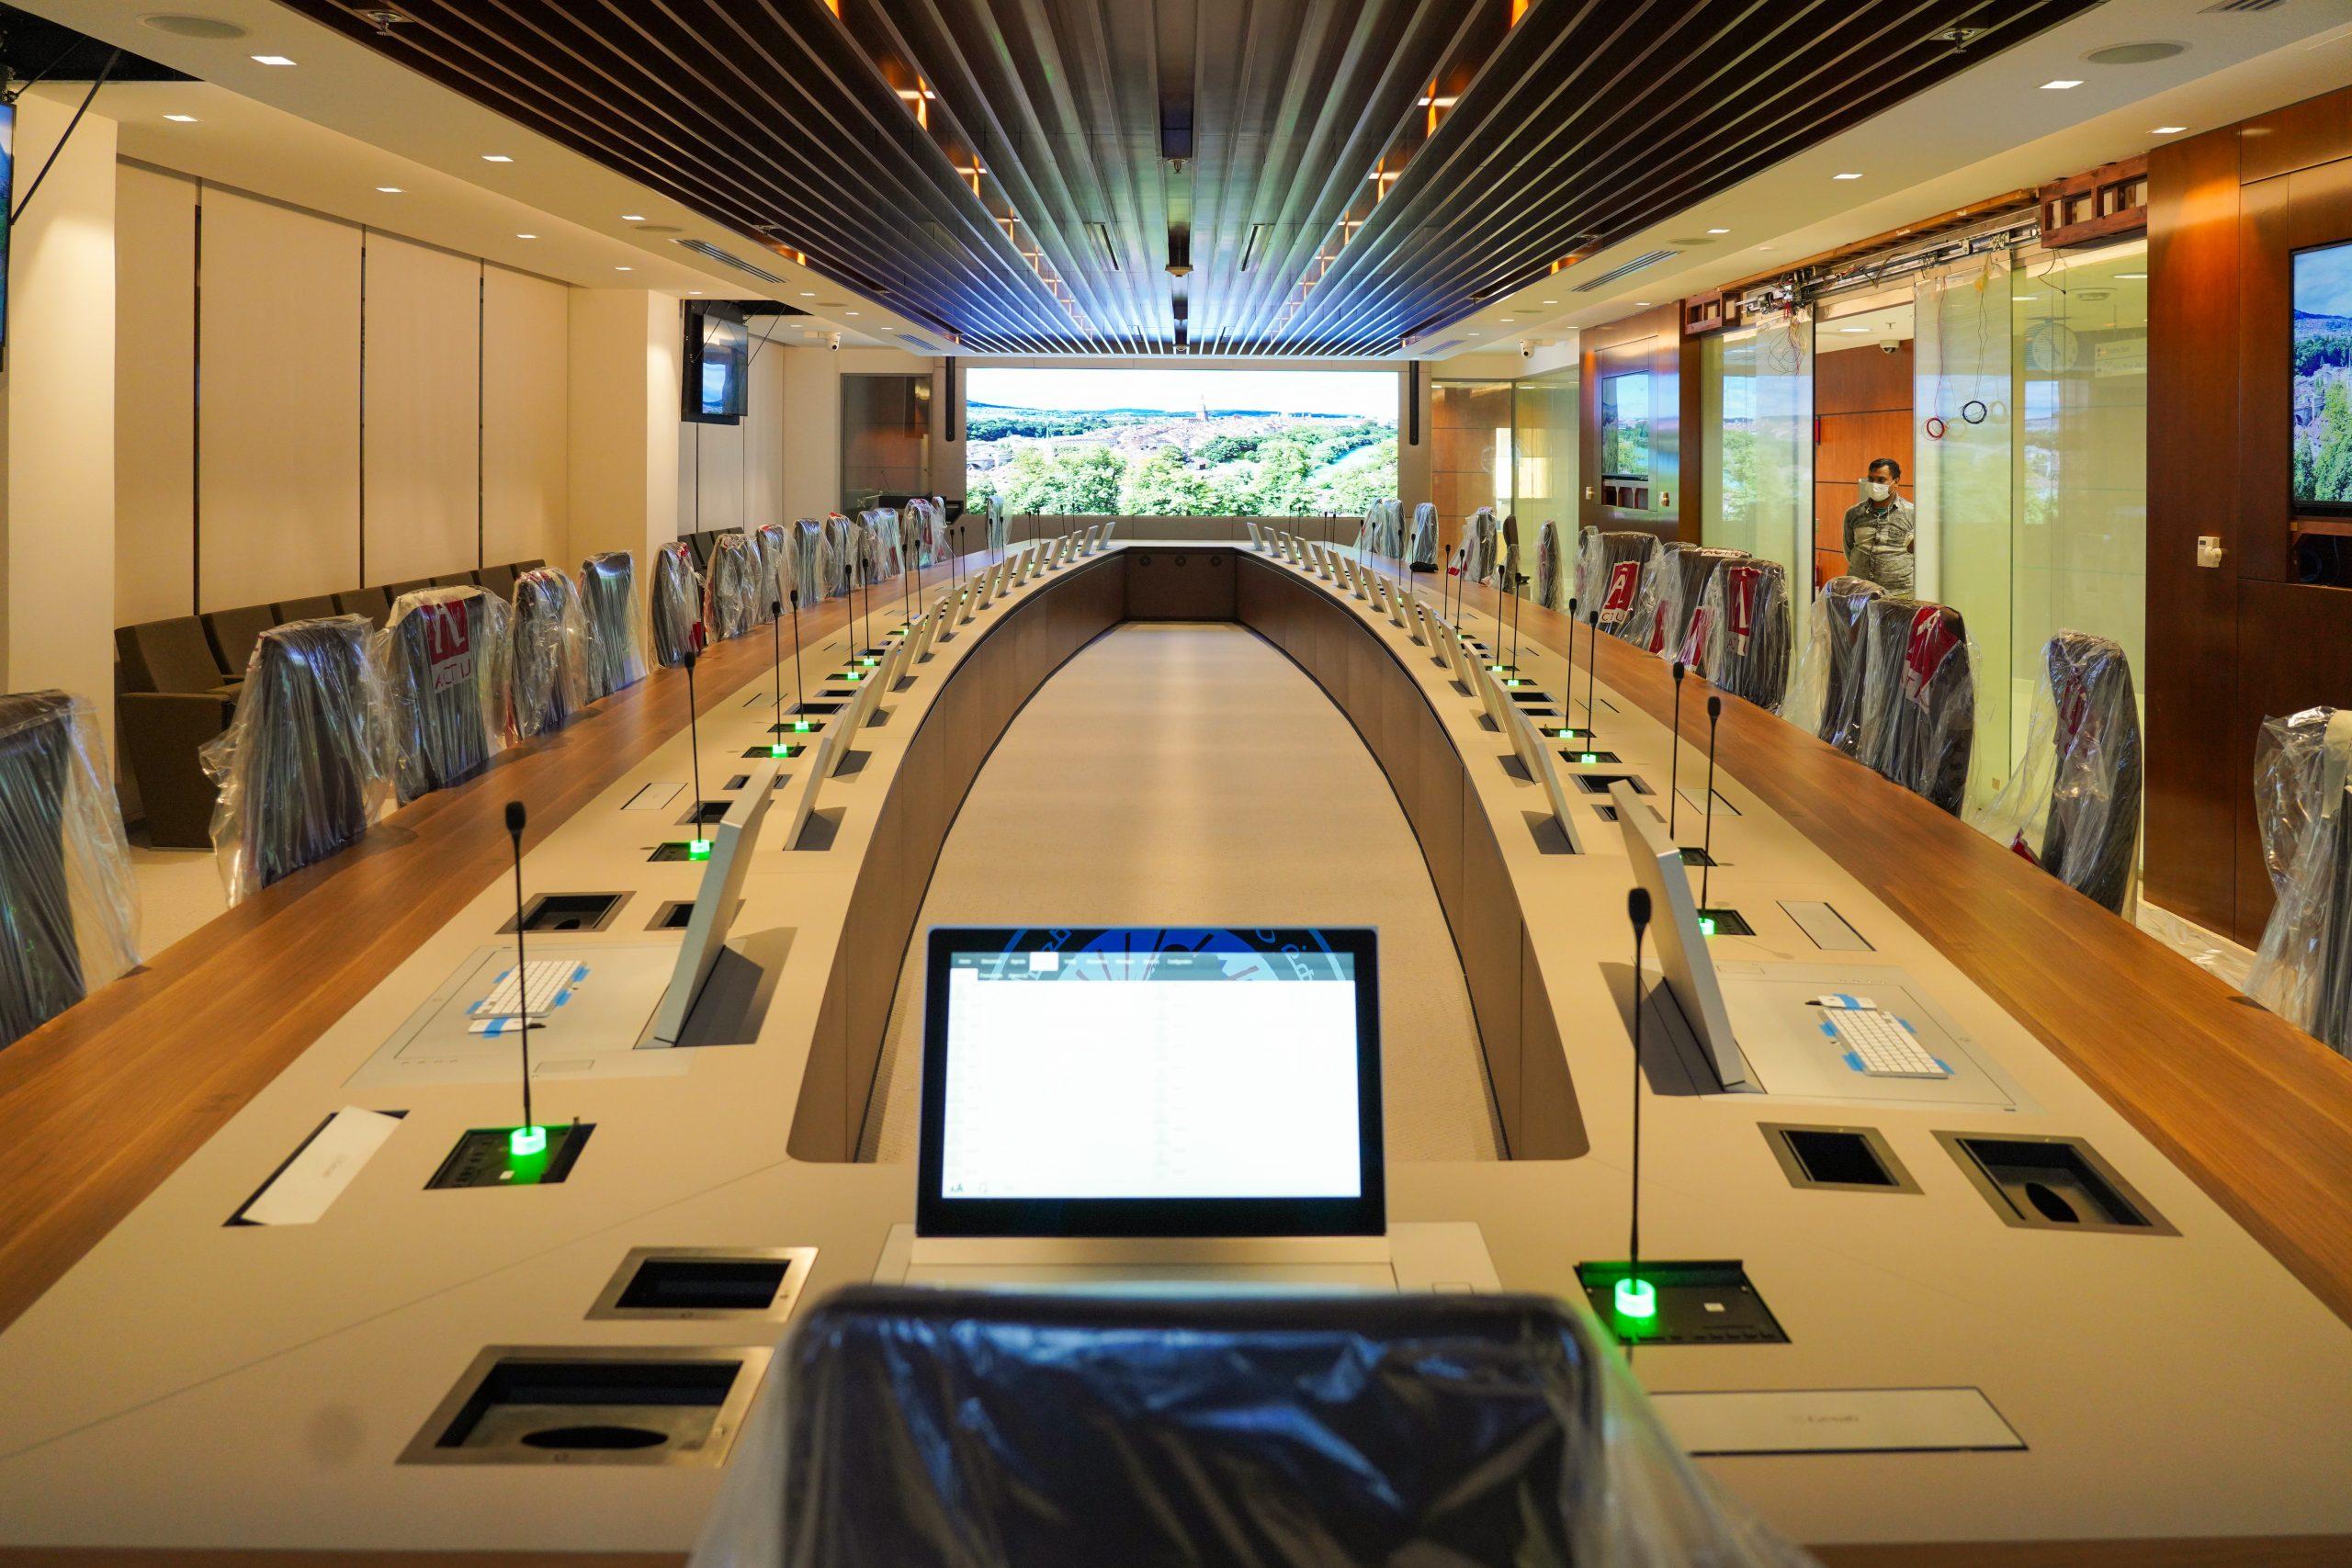 The conference room at Prince Mohammad Bin Fahd University in Al Khobar